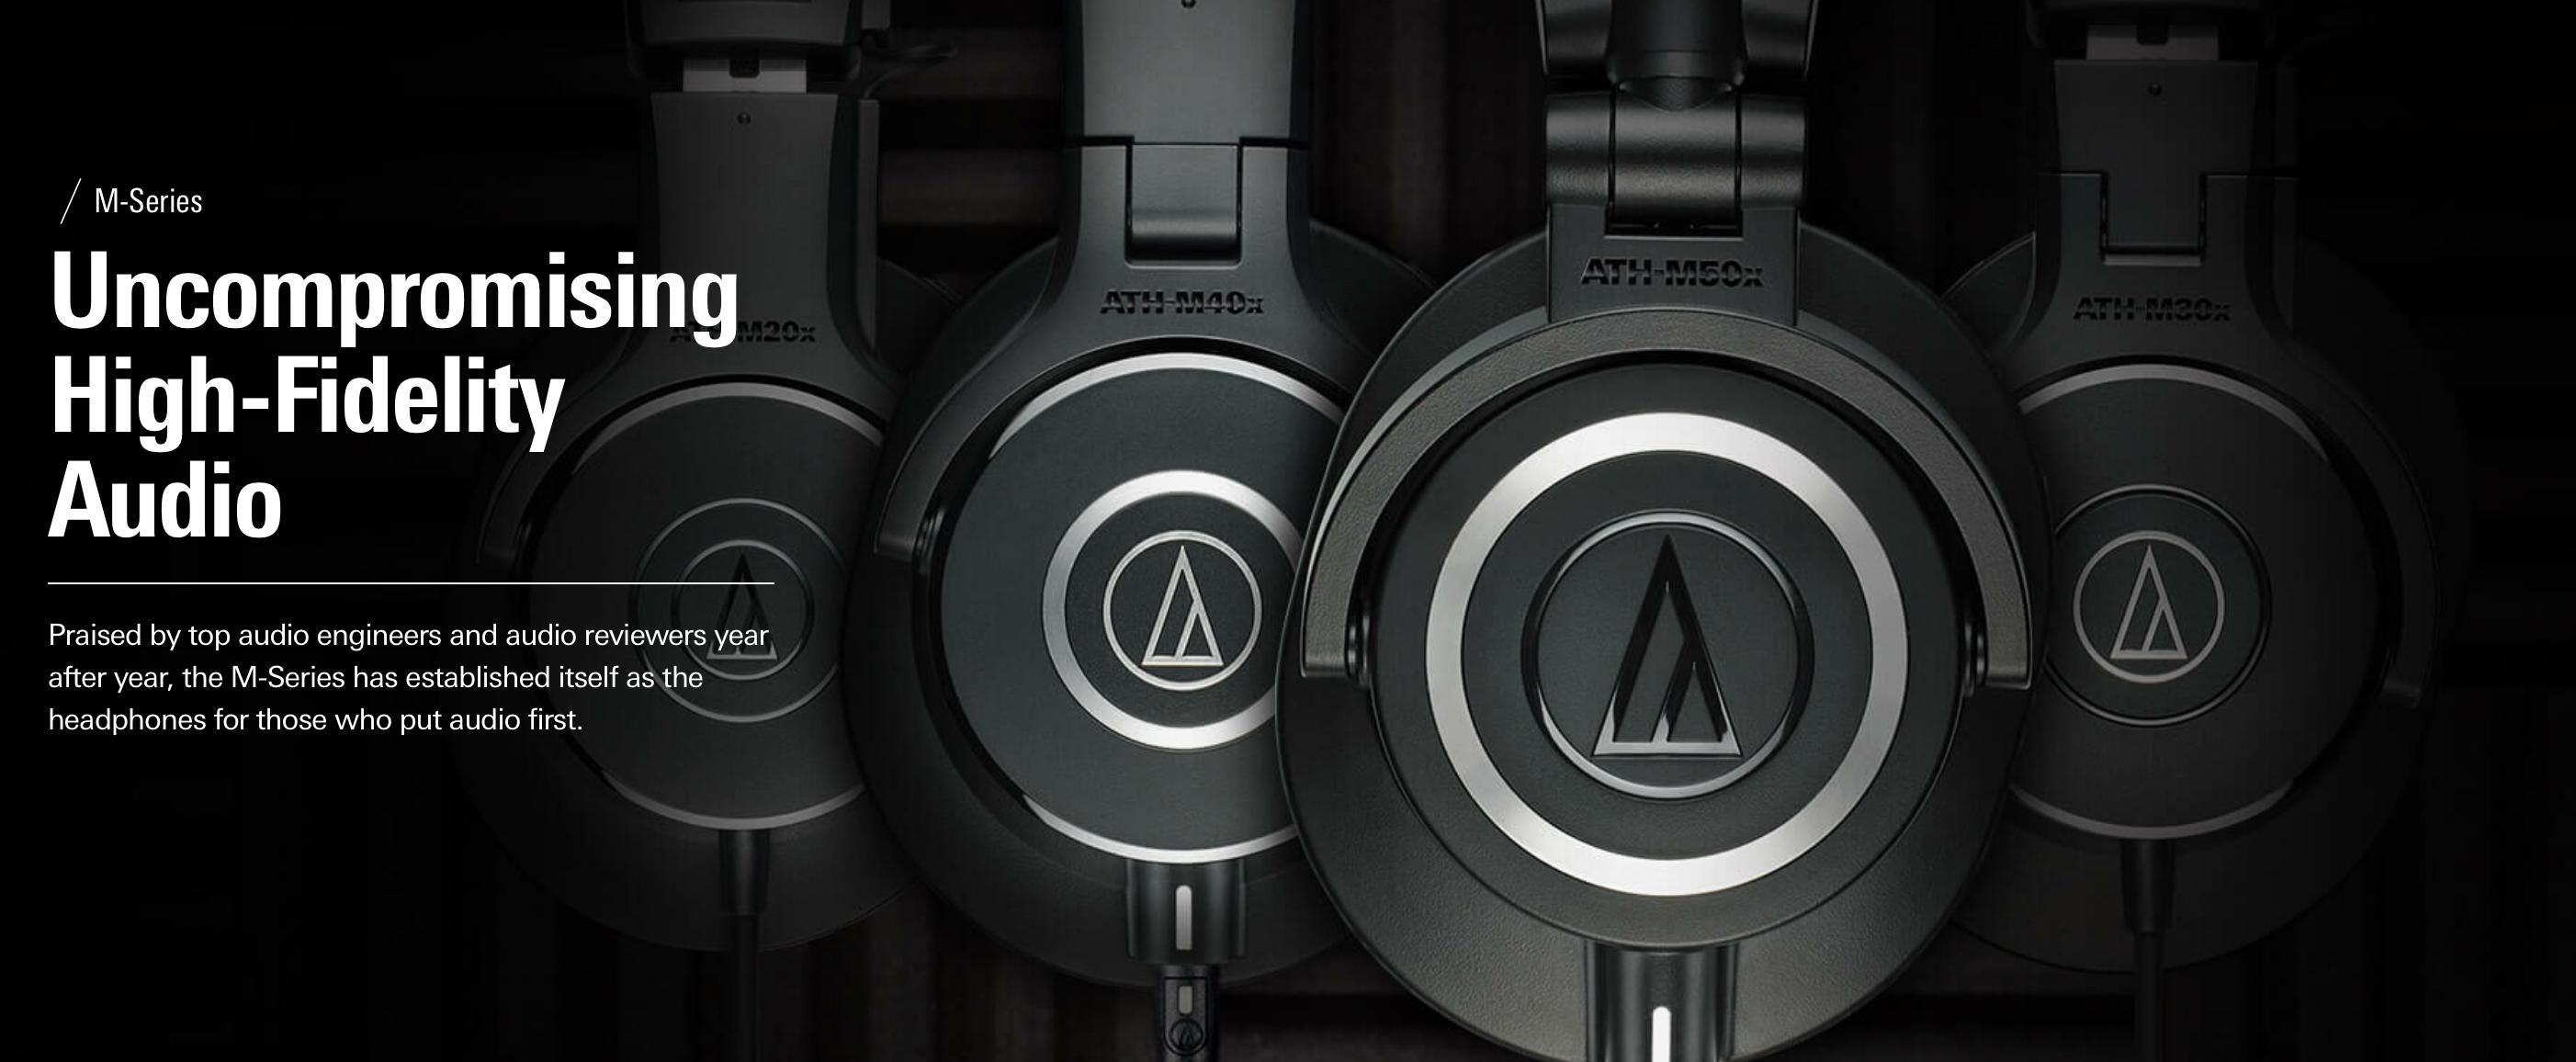 4 Audio Technica M50 Series Headphones